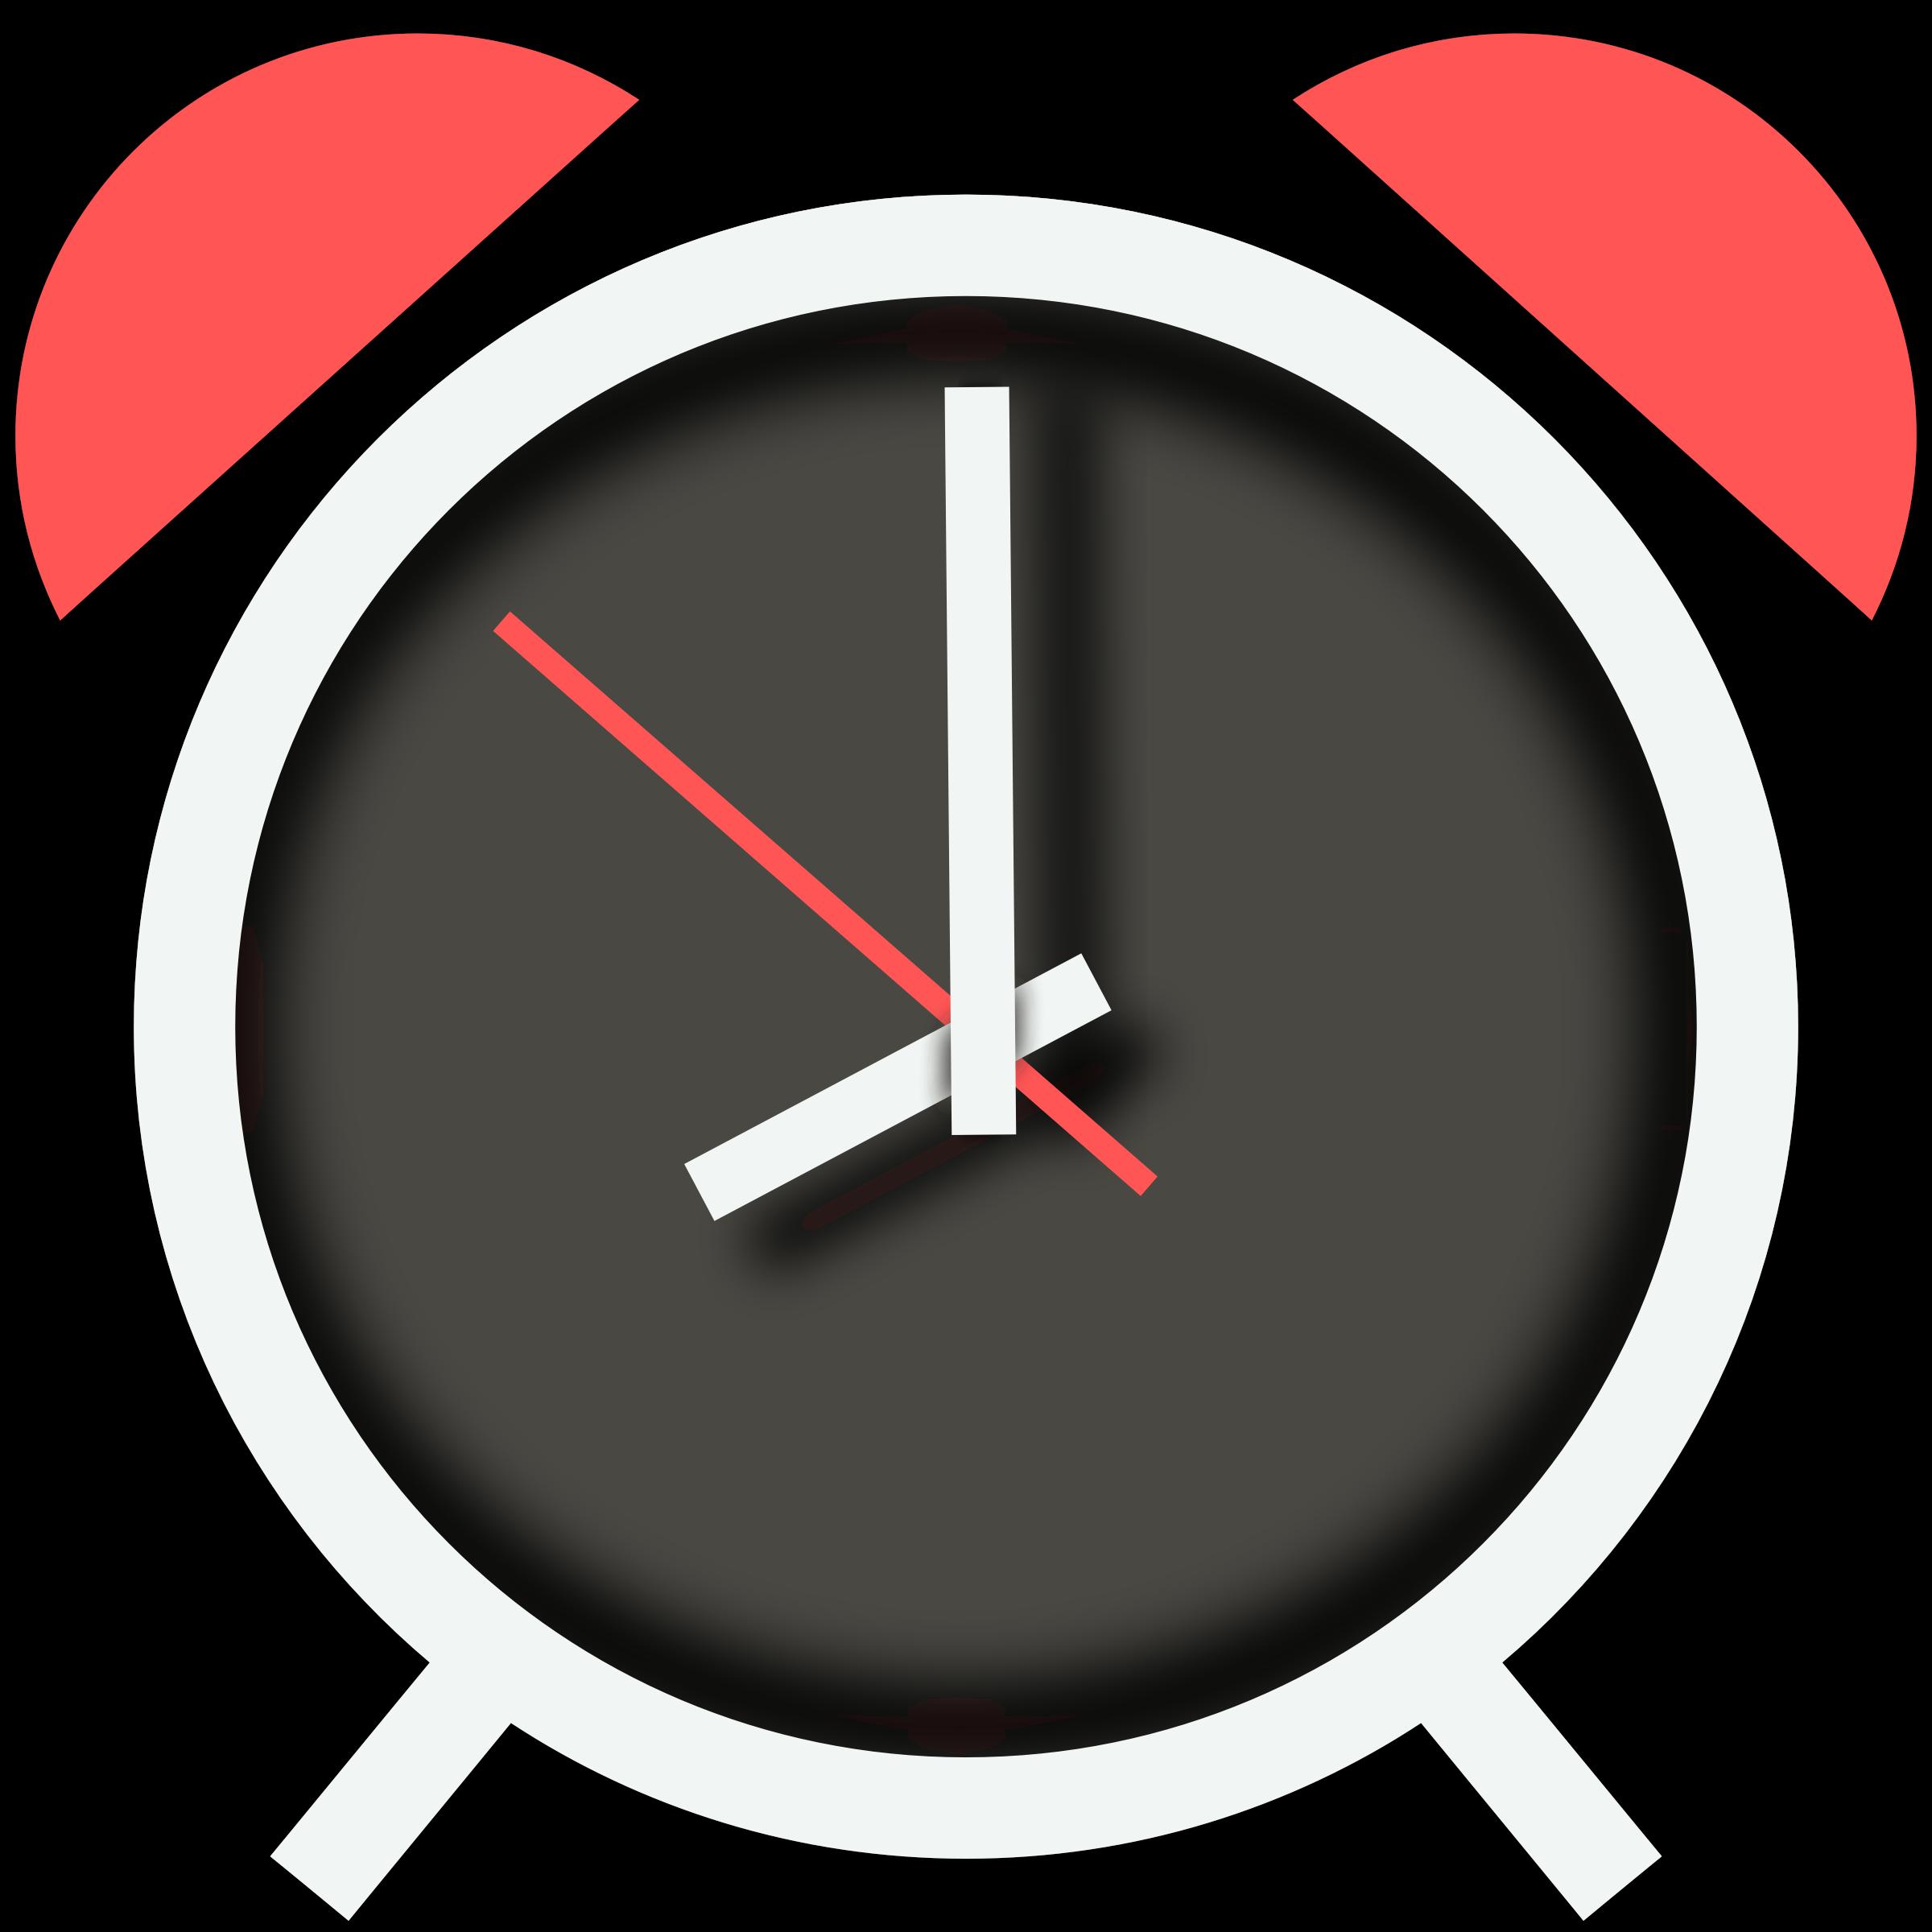 Clock clipart half past. Alarm icon jelly beam